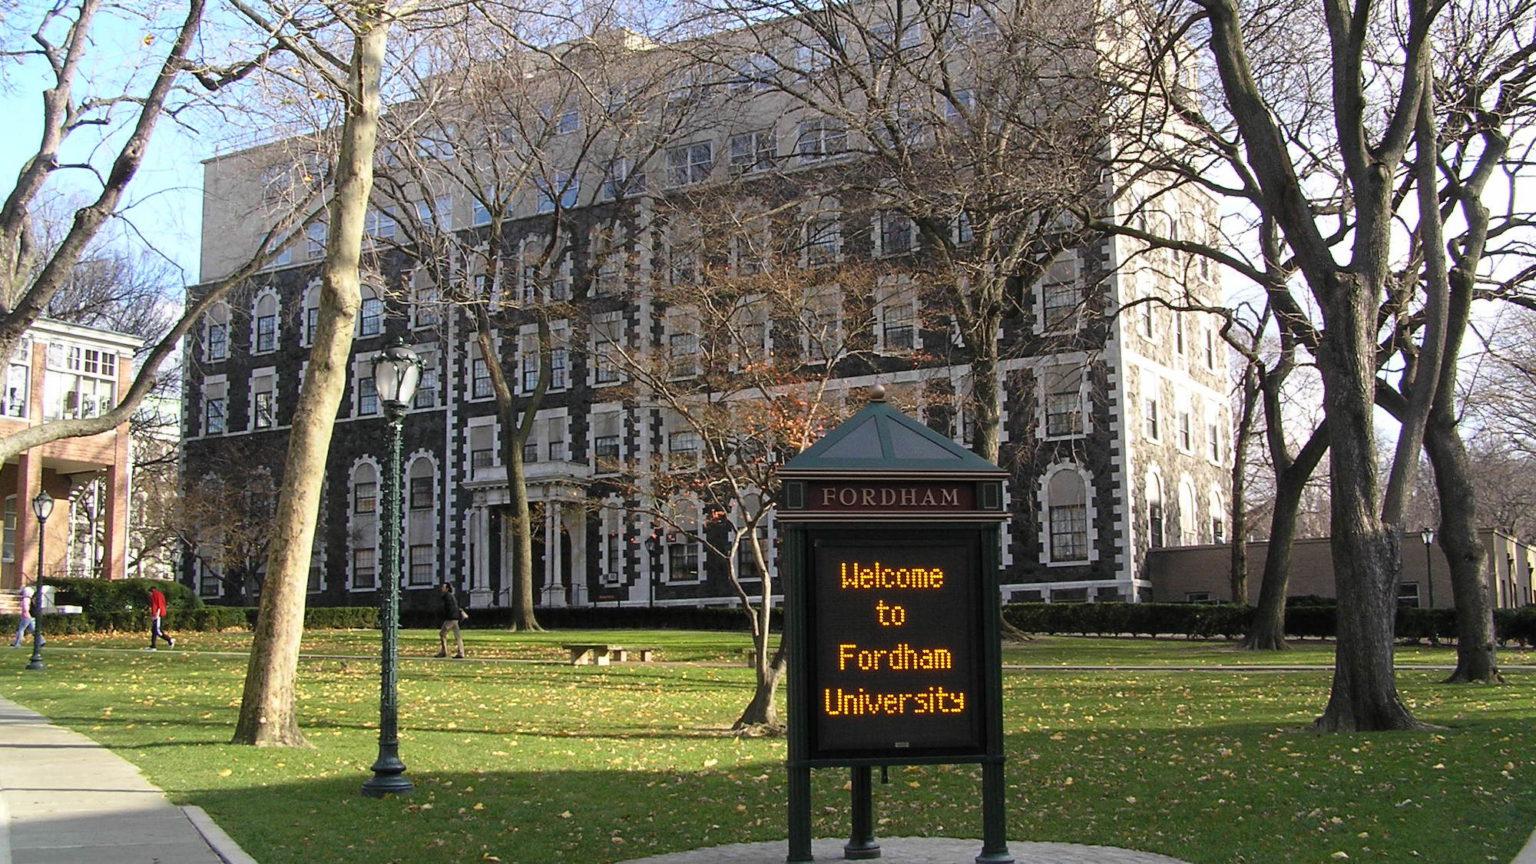 Campus censorship is still rife in the Covid era